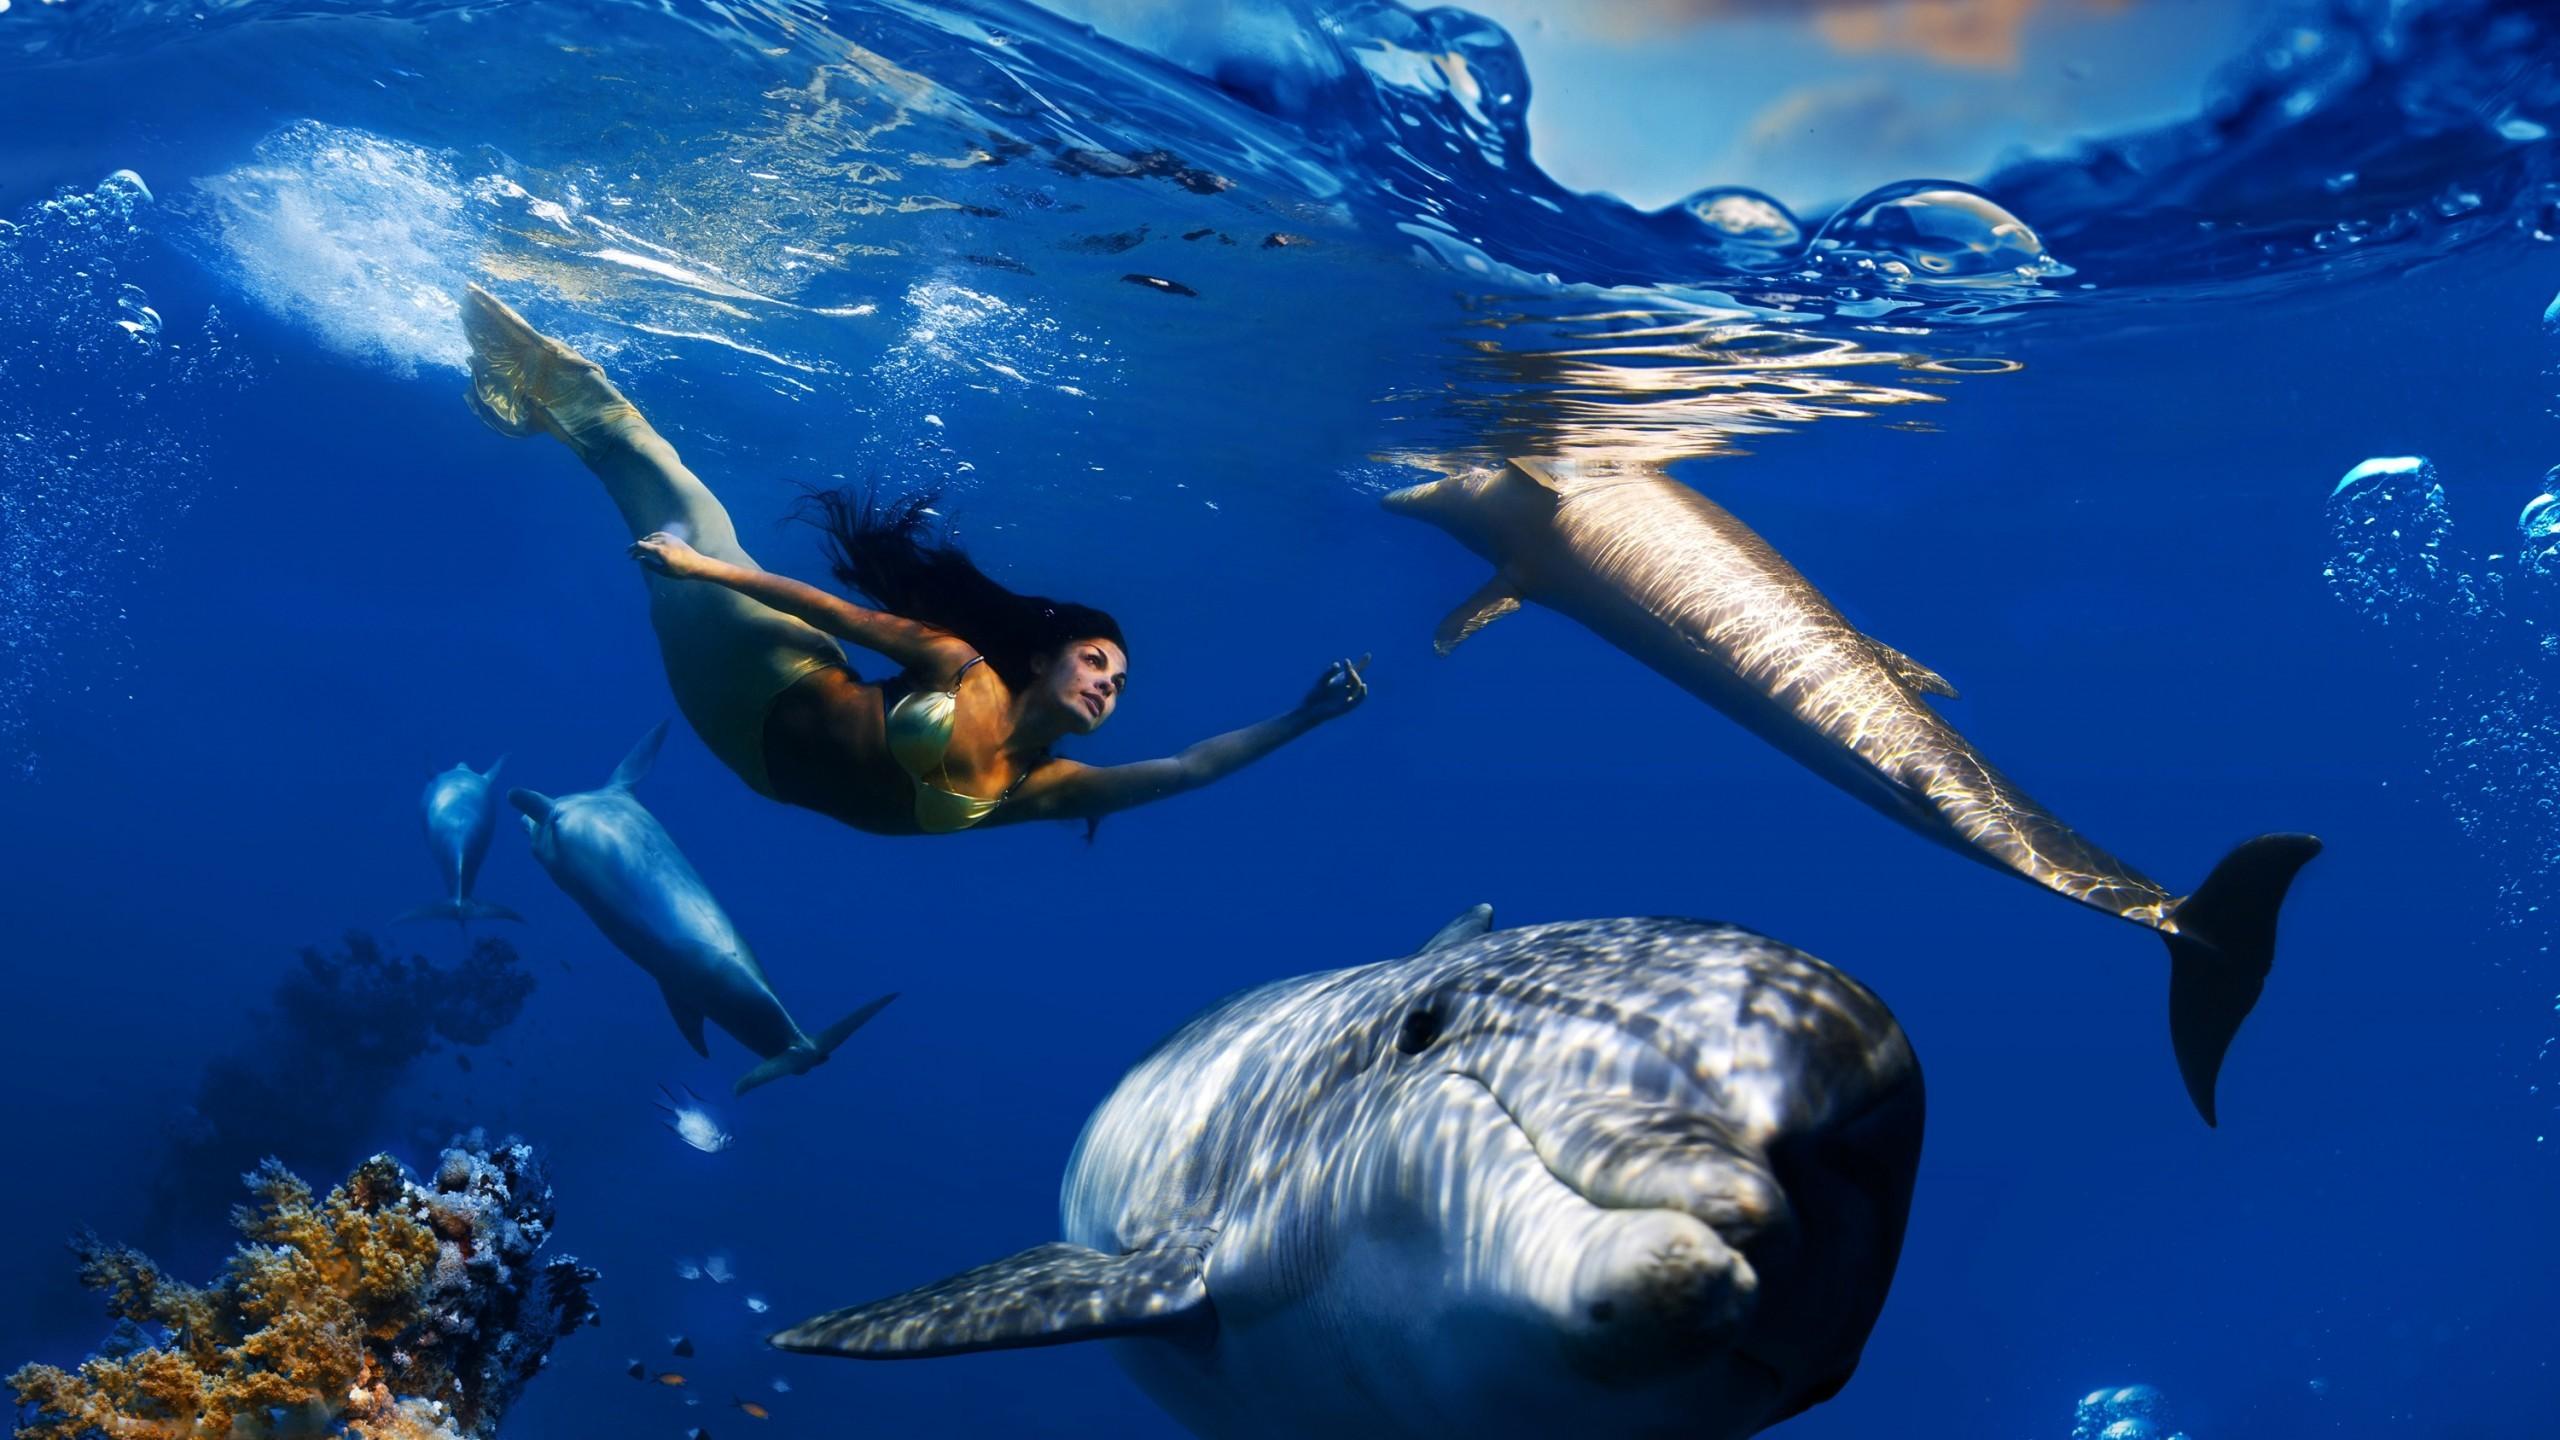 Creative Graphics / Mermaid Wallpaper